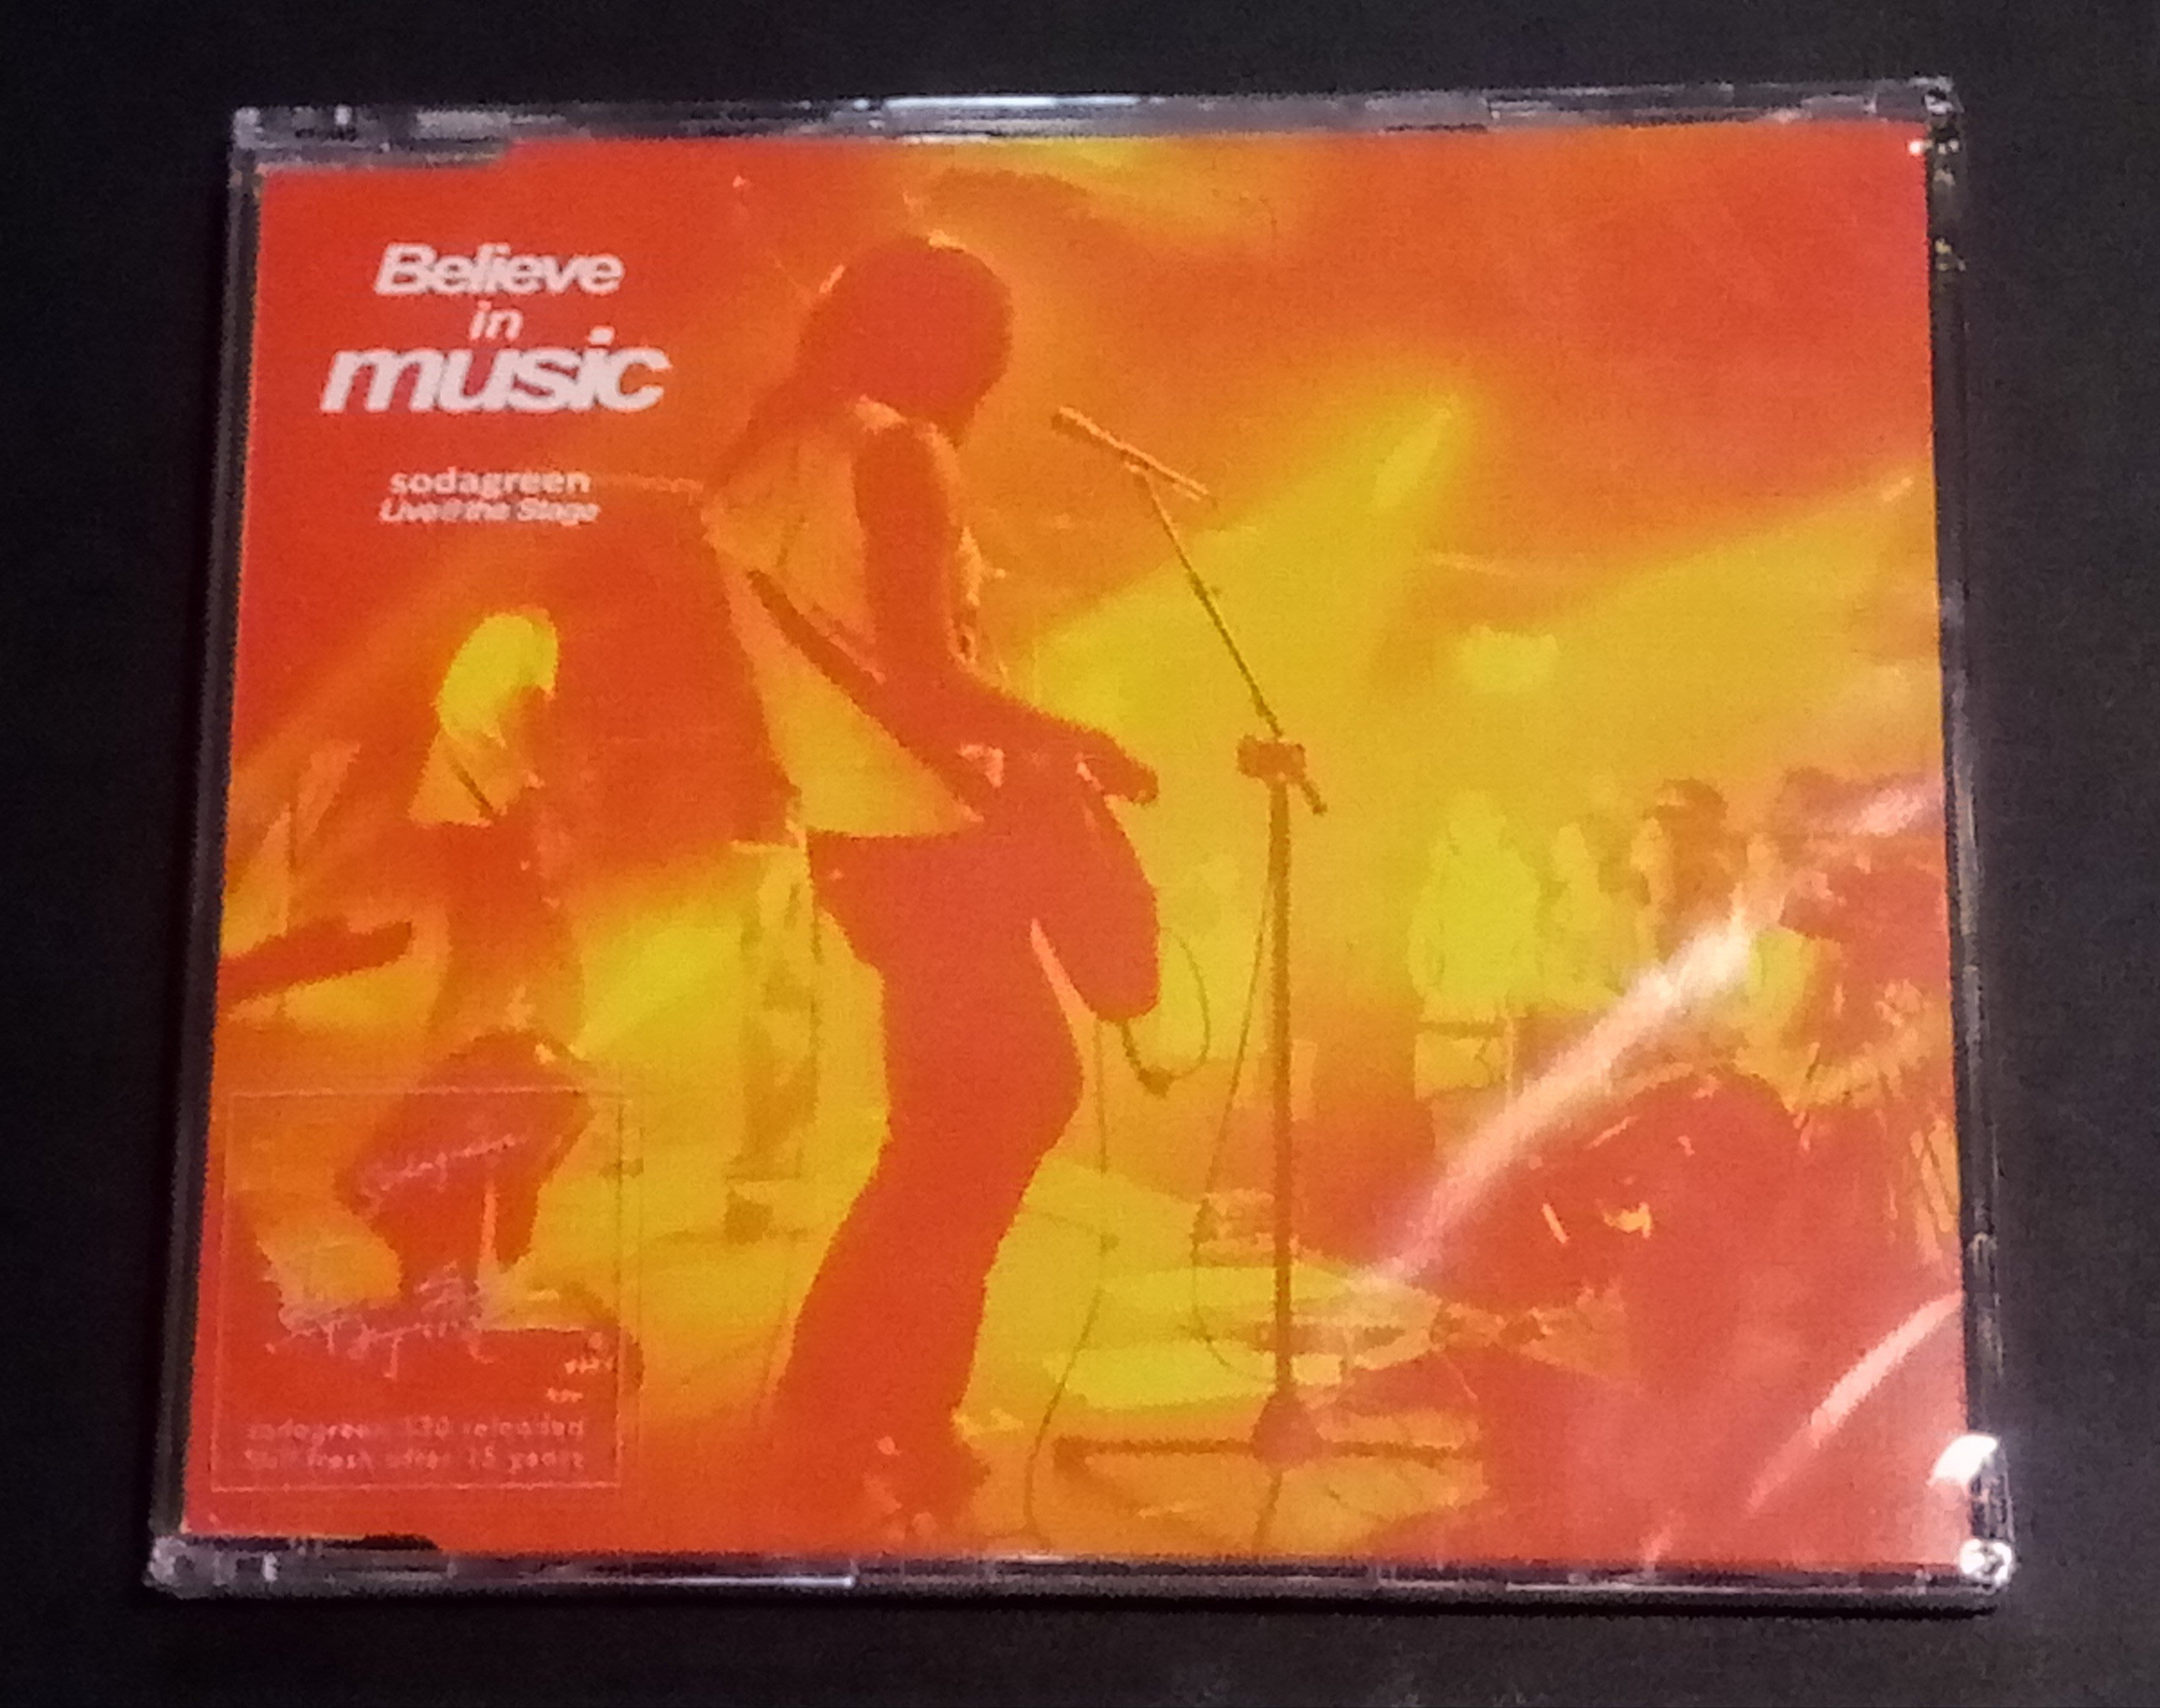 ( 530 Reload蘇打綠日, EP,全新未拆封 ) 蘇打綠 : Believe in Music